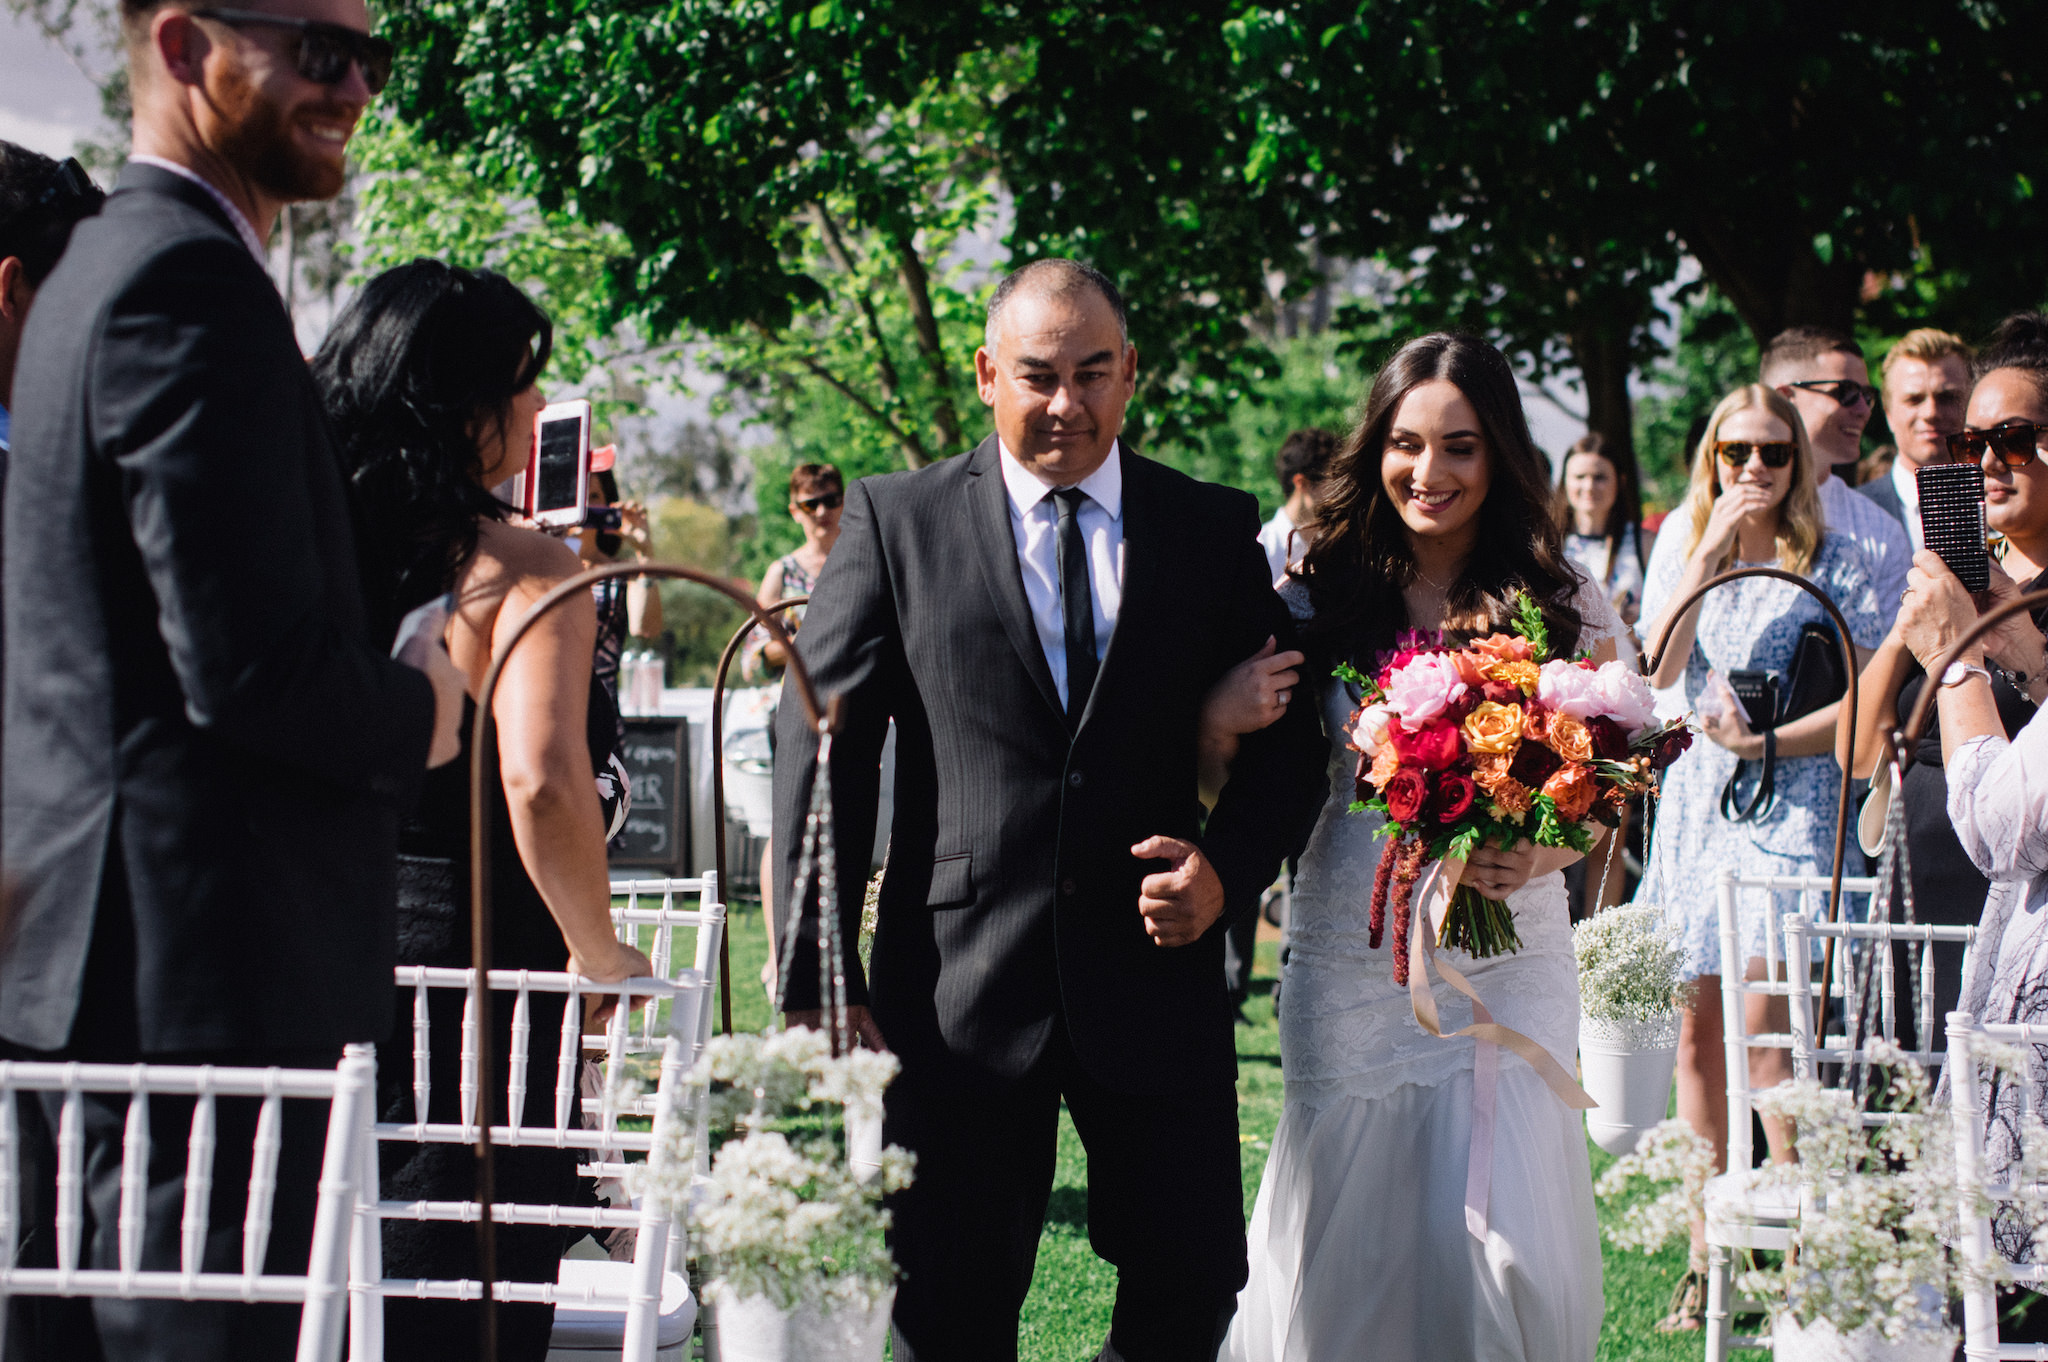 Laurelville Manor Ceremony Sarah Marvin York Wedding Photographer 4